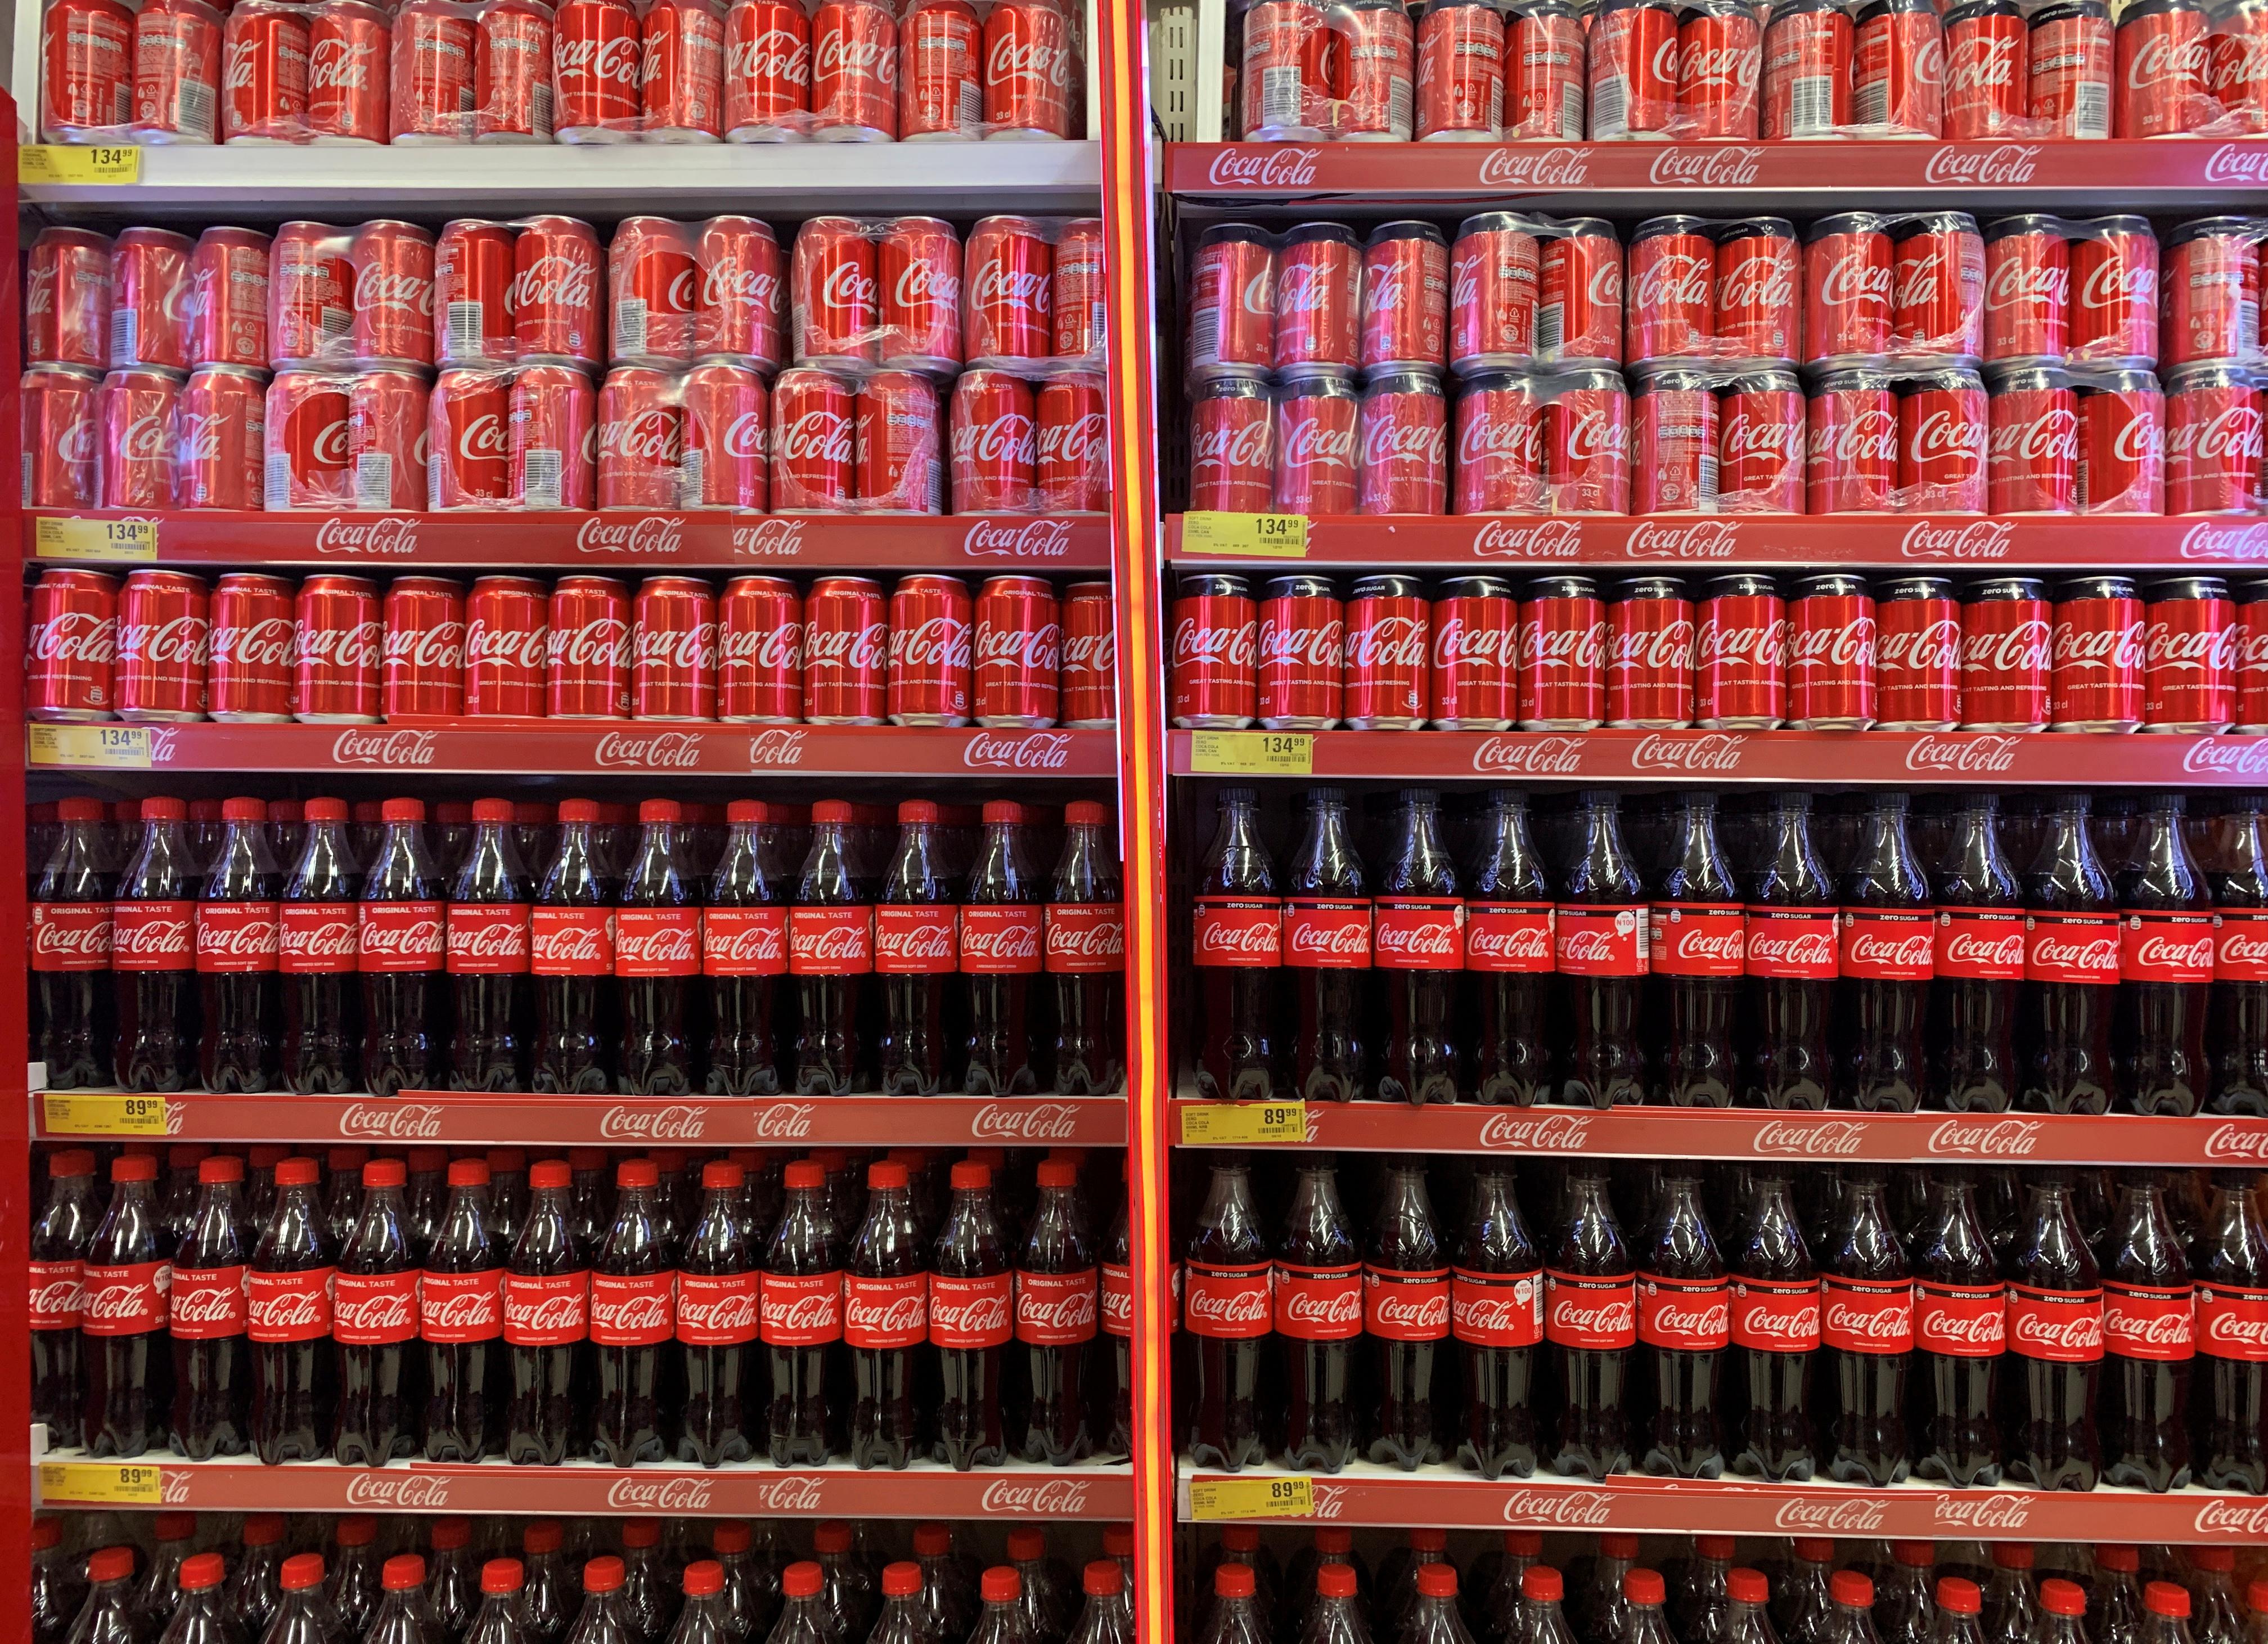 Coca Cola: Η βιώσιμη ανάπτυξη στους βασικούς πυλώνες της πολιτικής της